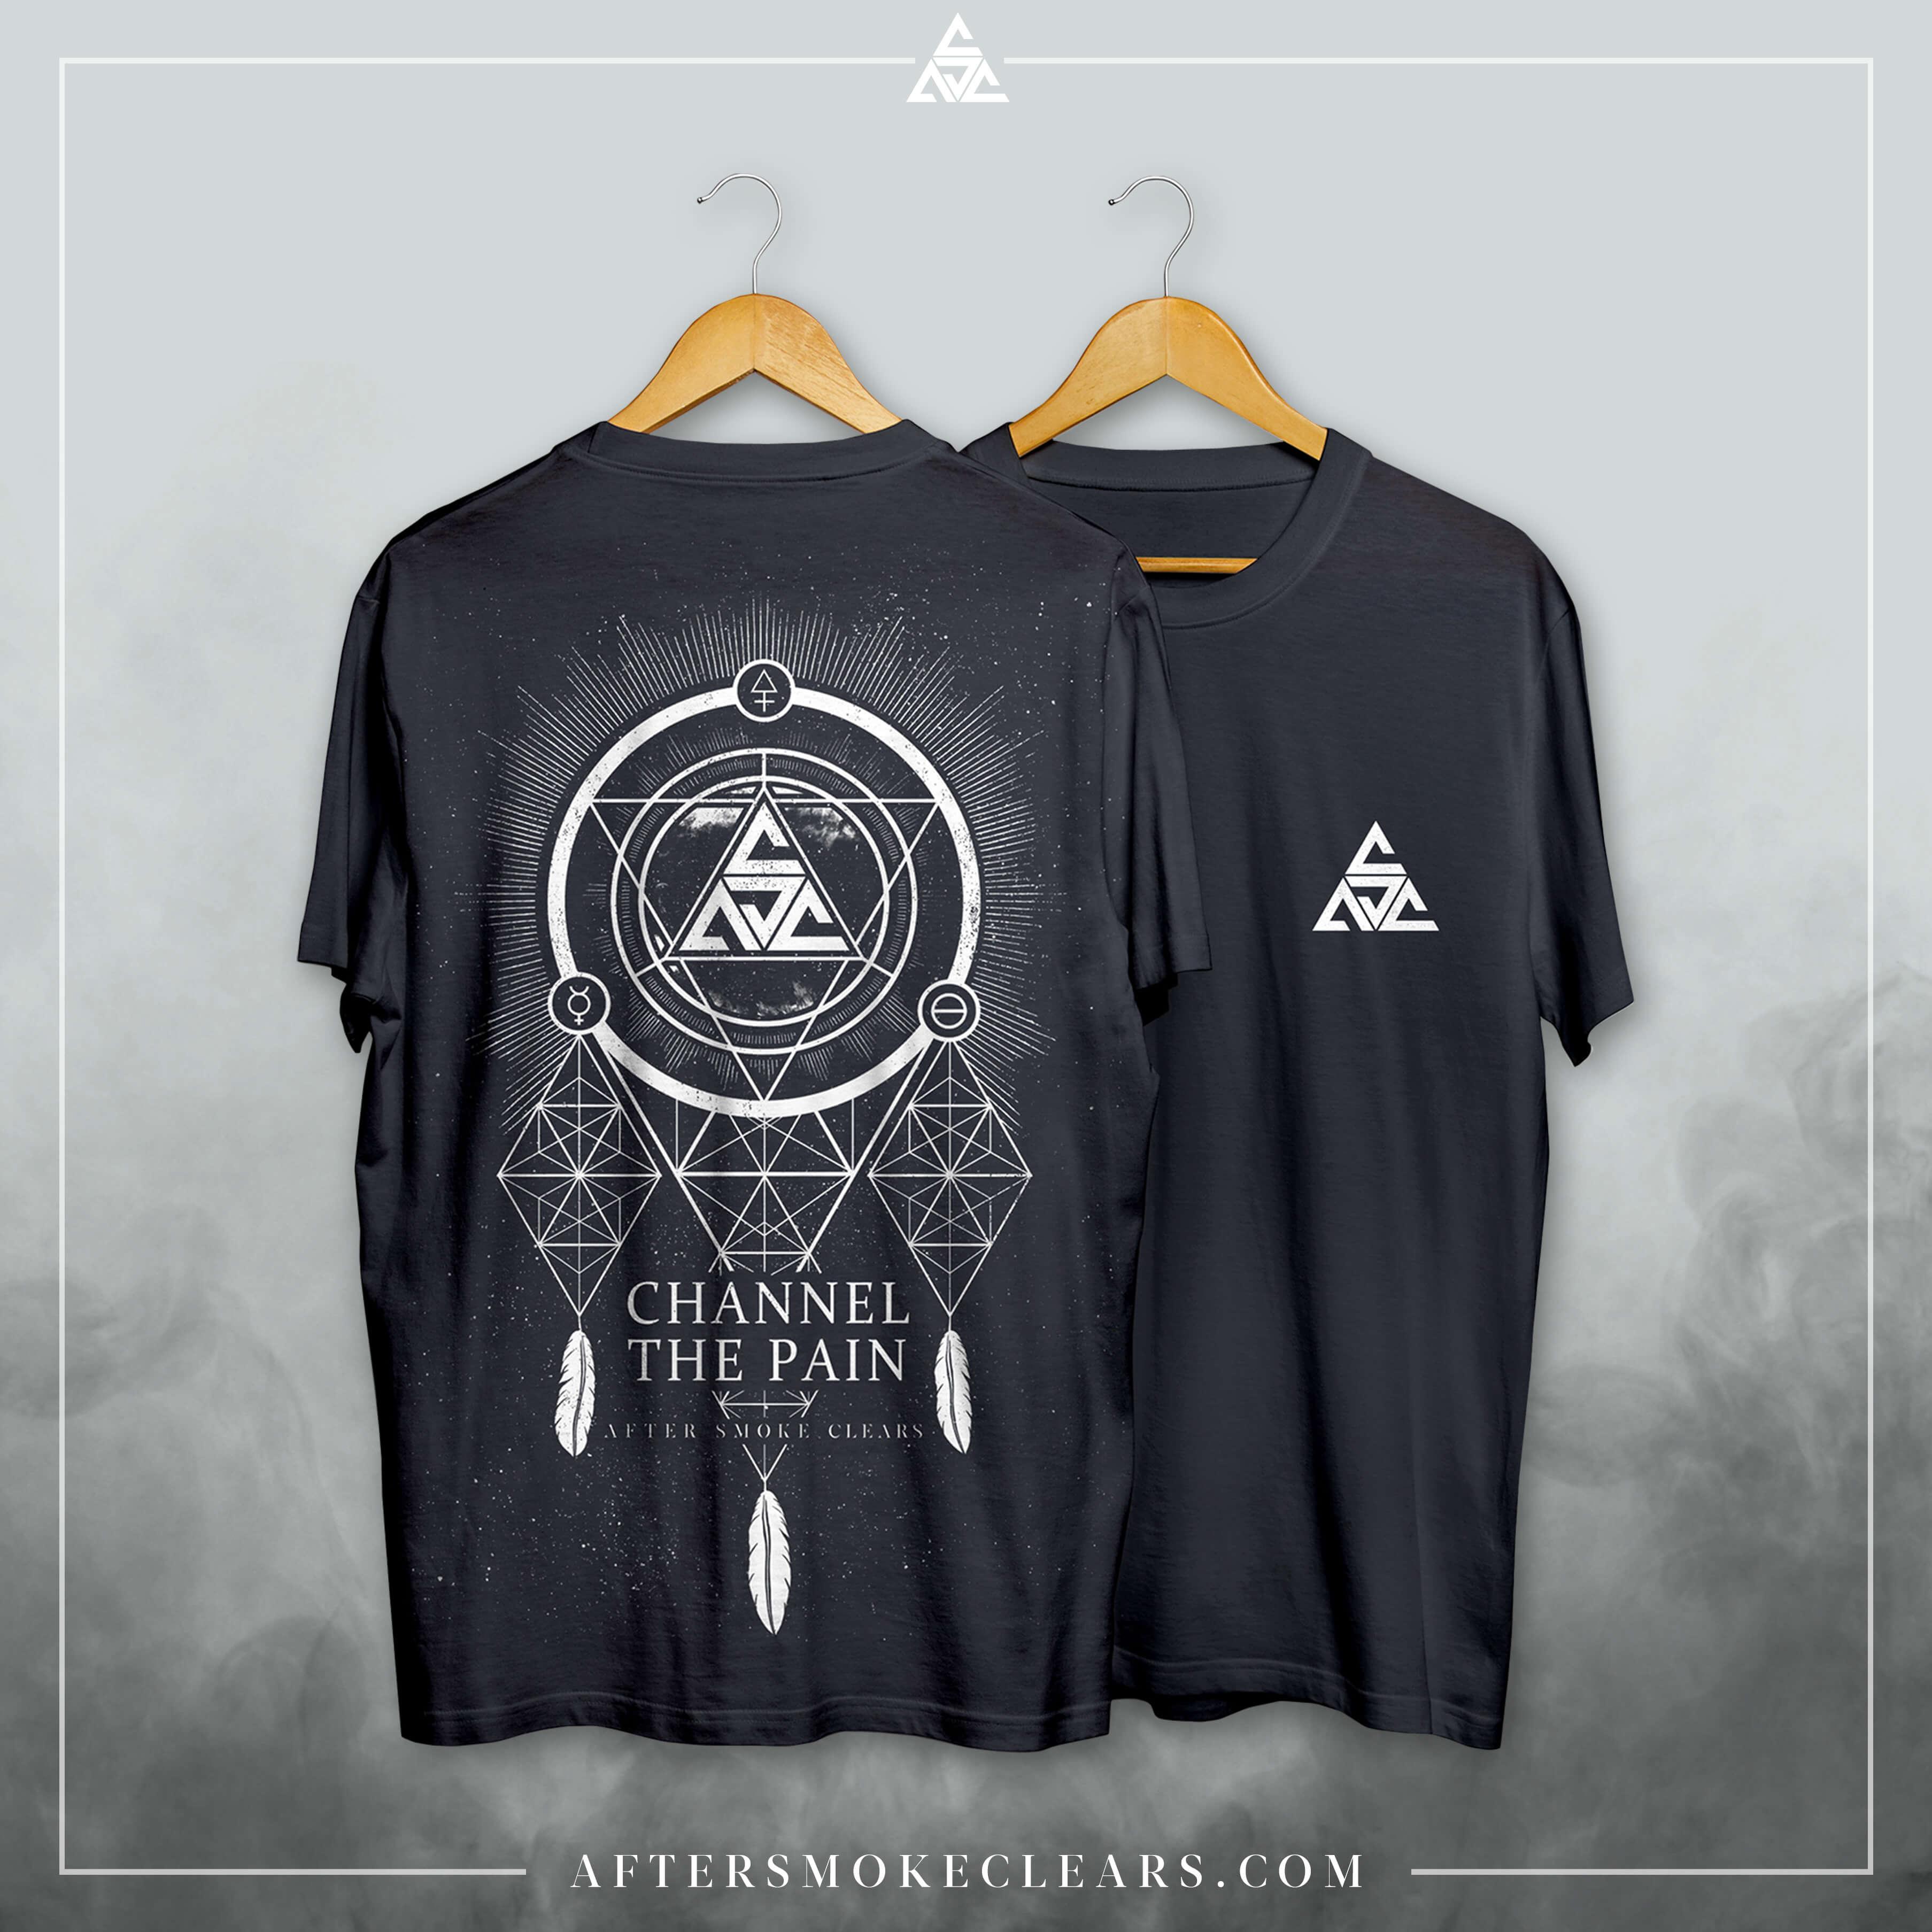 'Beta To Gamma' - Black T-shirt